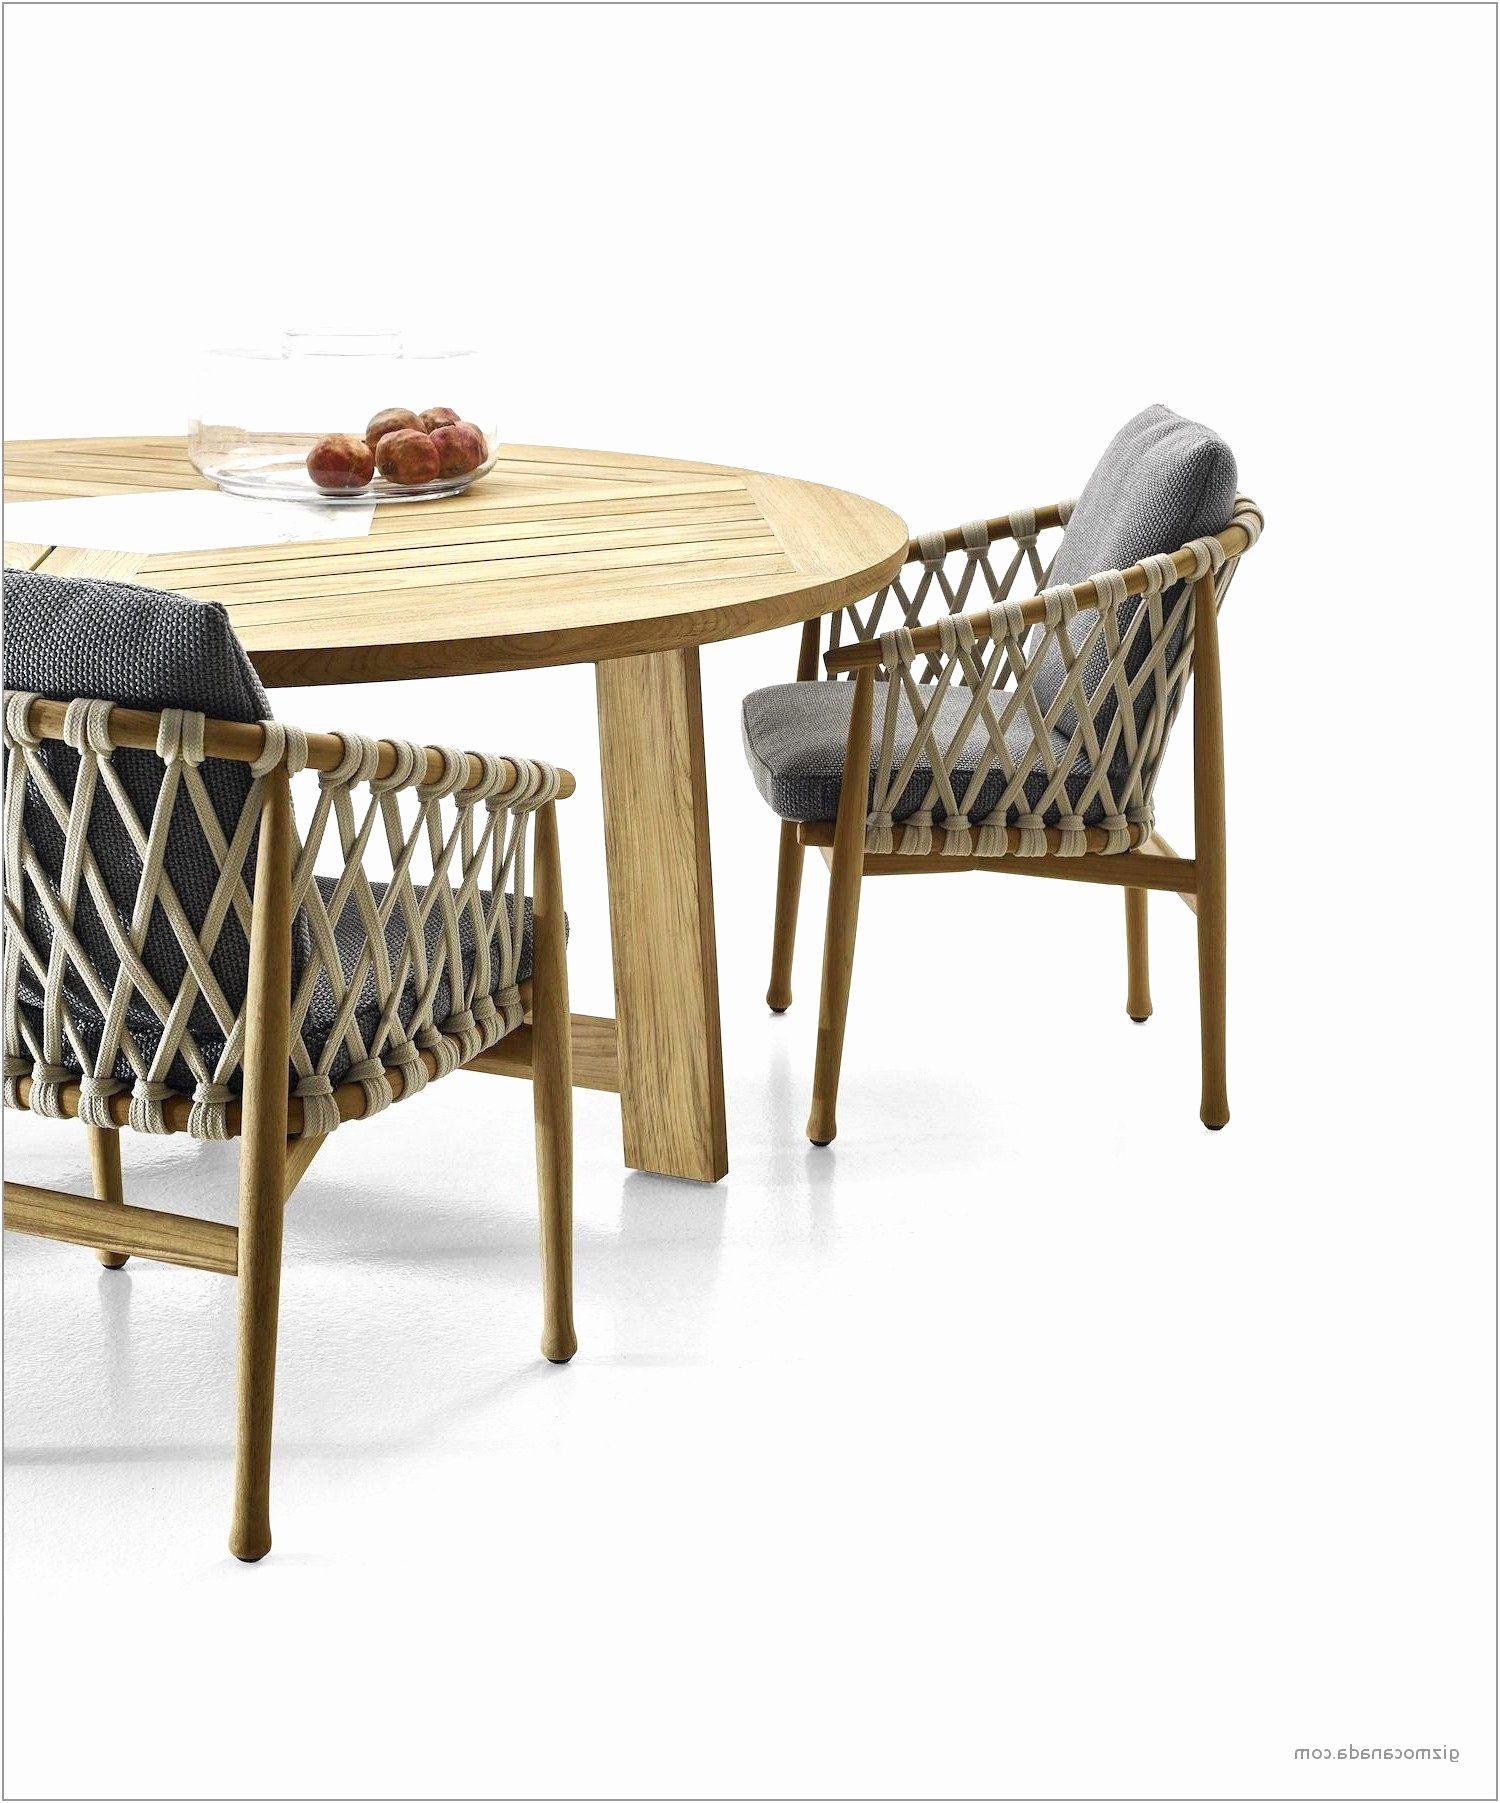 Lit D Appoint Ikea Douce Table D Appoint Ikea Inspiré Ikea Patio Set Best Ikea White Round